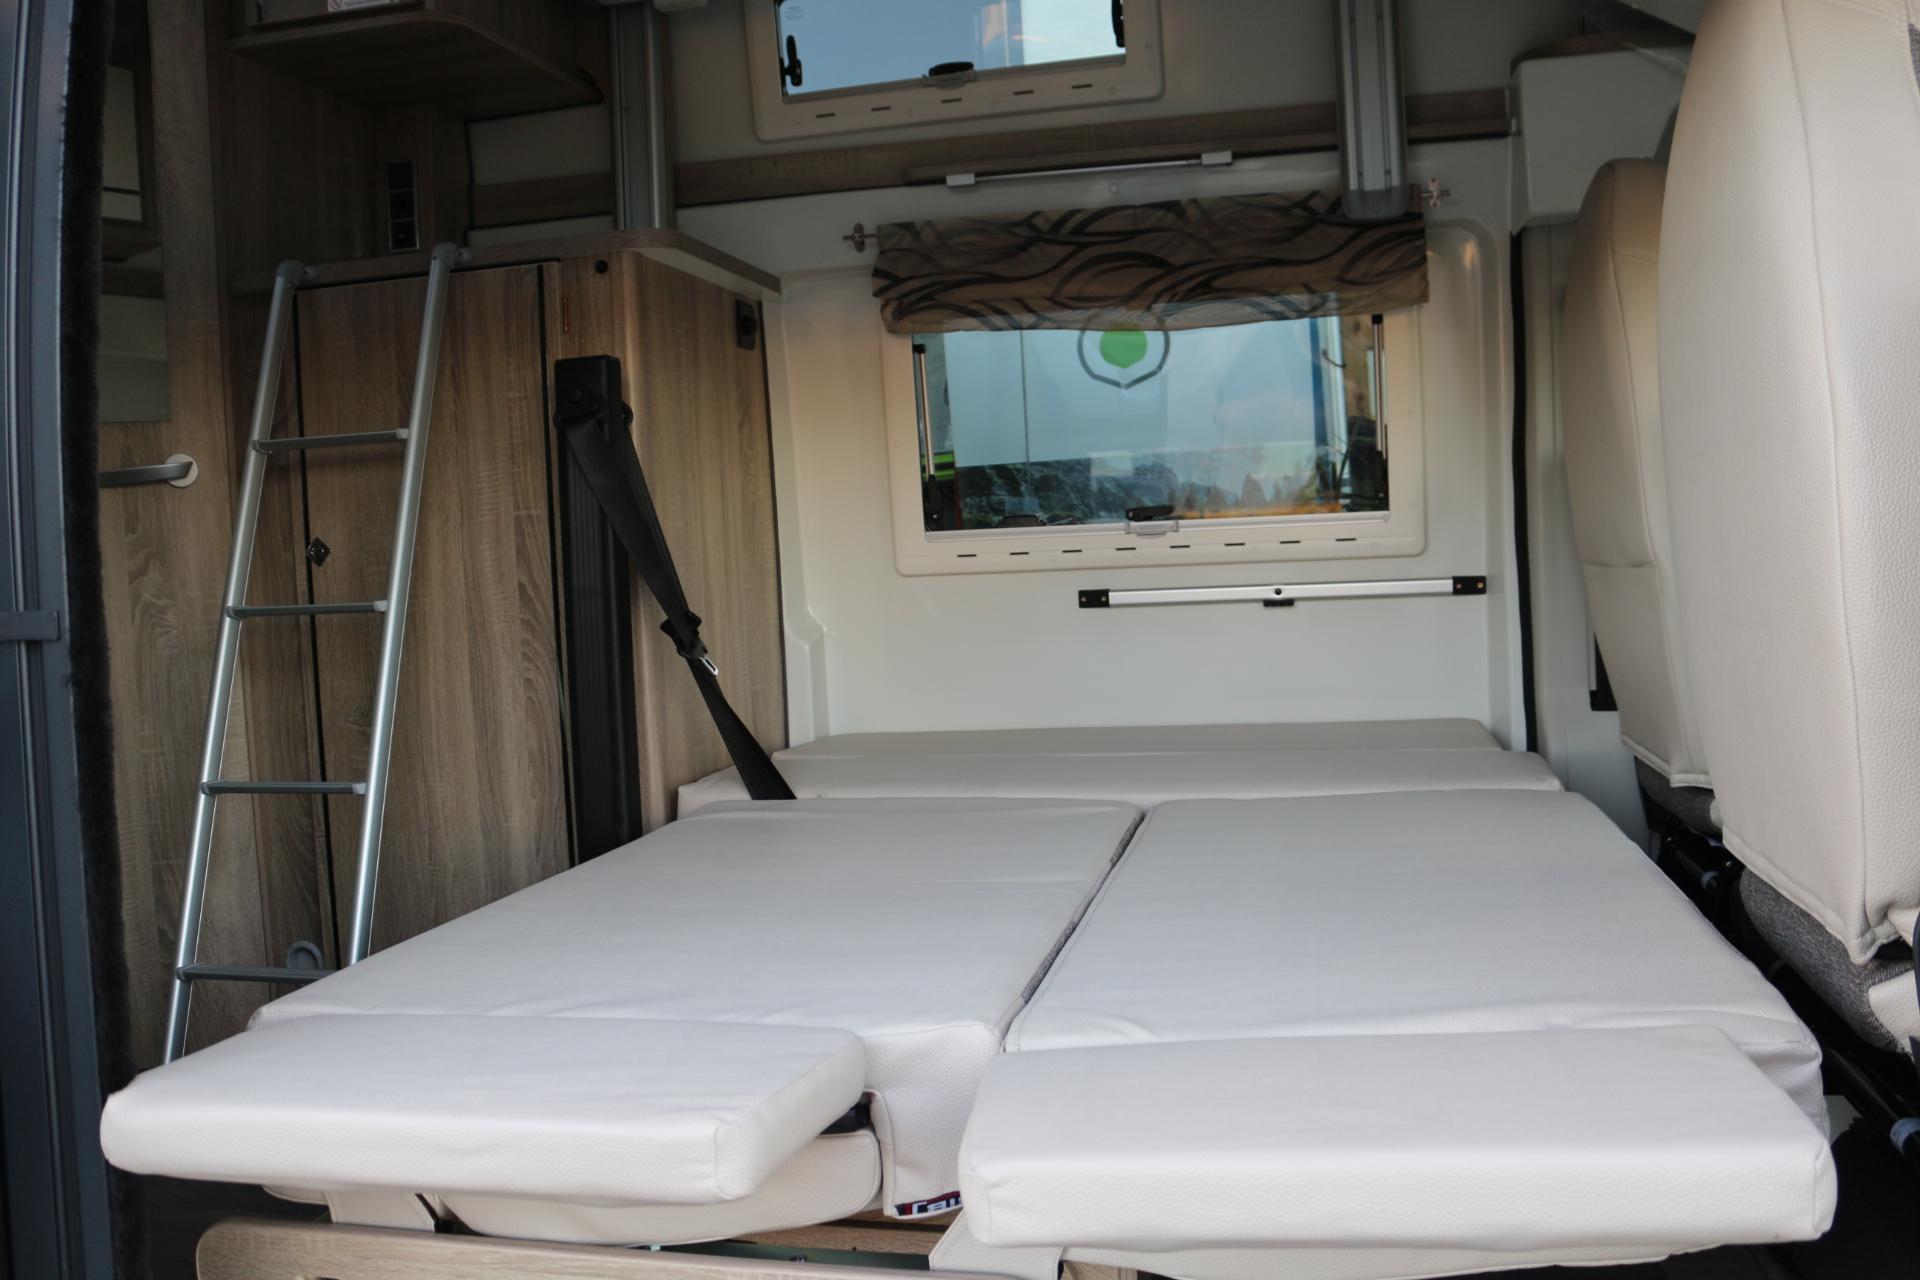 karmann dexter 550 blanca 12 catalunya van. Black Bedroom Furniture Sets. Home Design Ideas